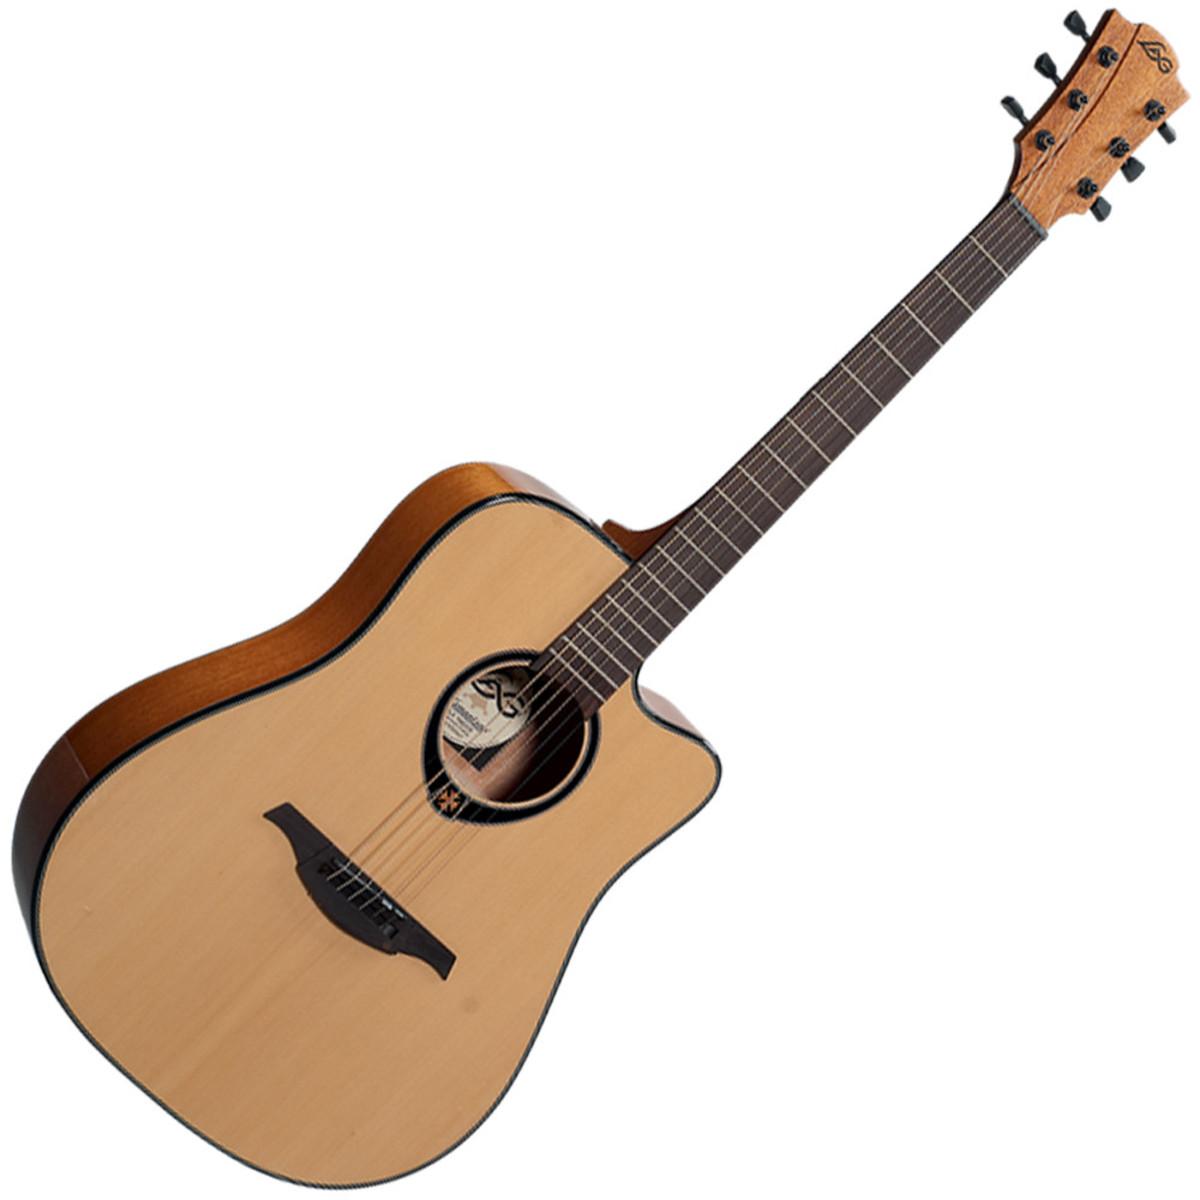 disc lag tramontane t66dc dreadnought cutaway acoustic guitar at. Black Bedroom Furniture Sets. Home Design Ideas